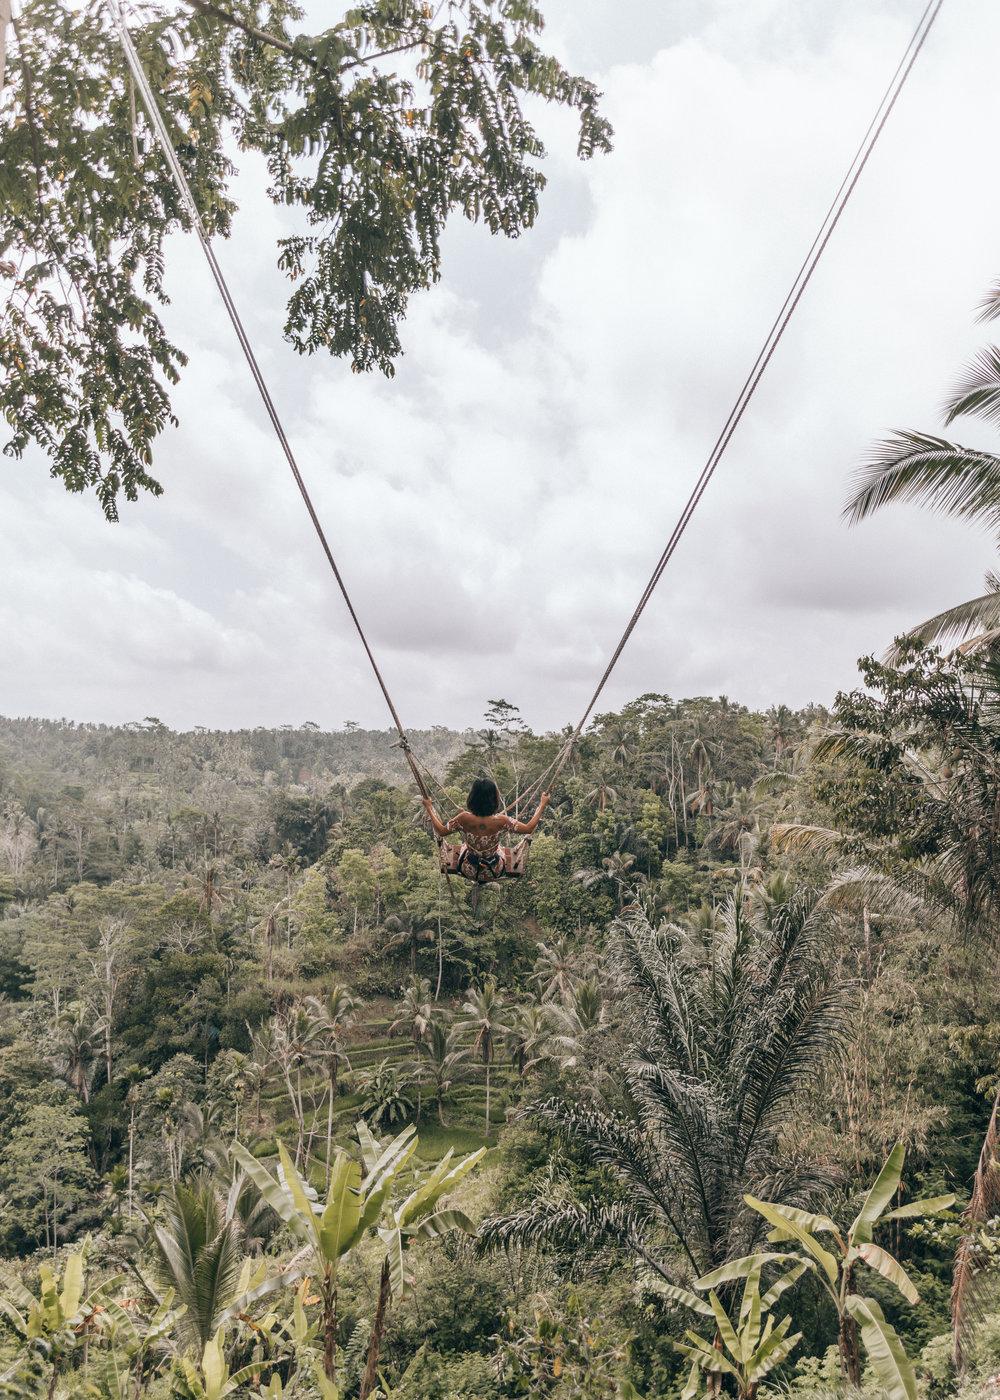 bali-swing-by-lisa-linh